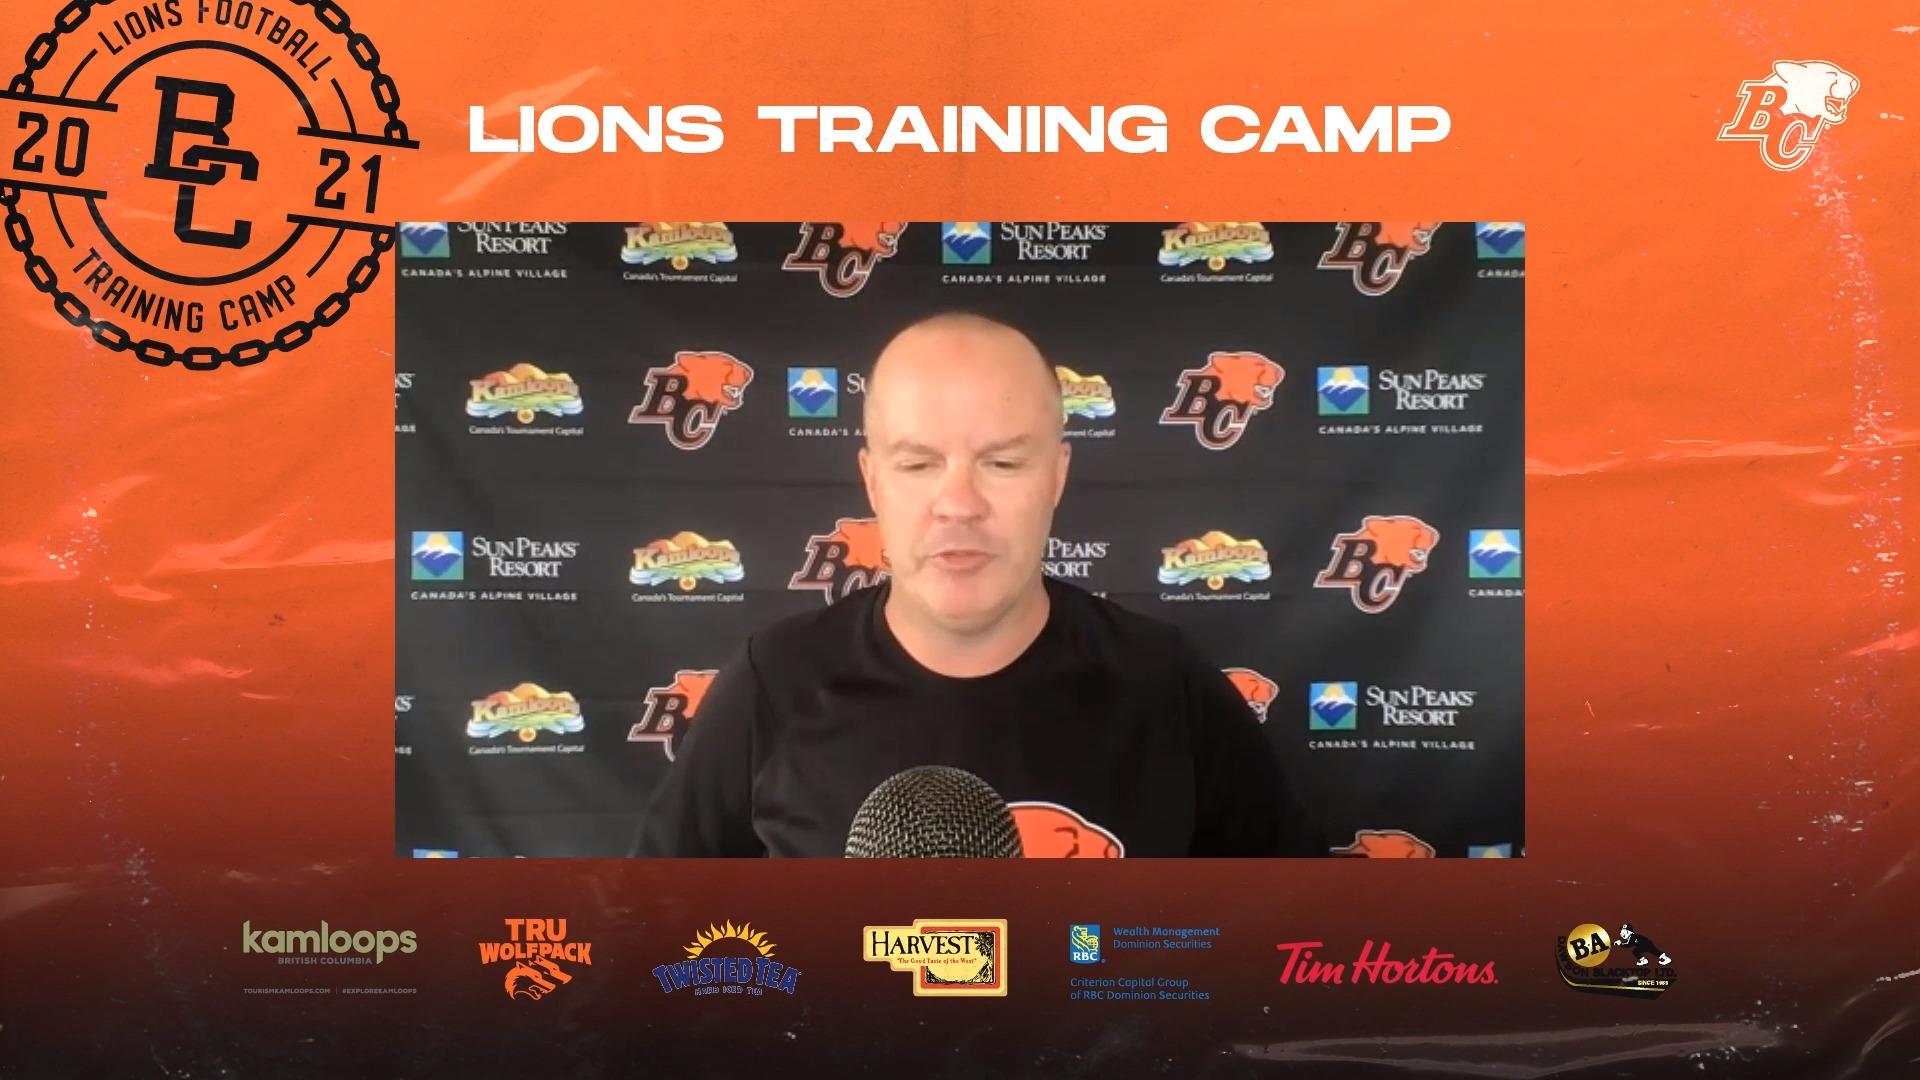 Training Camp July 26 | Rick Campbell